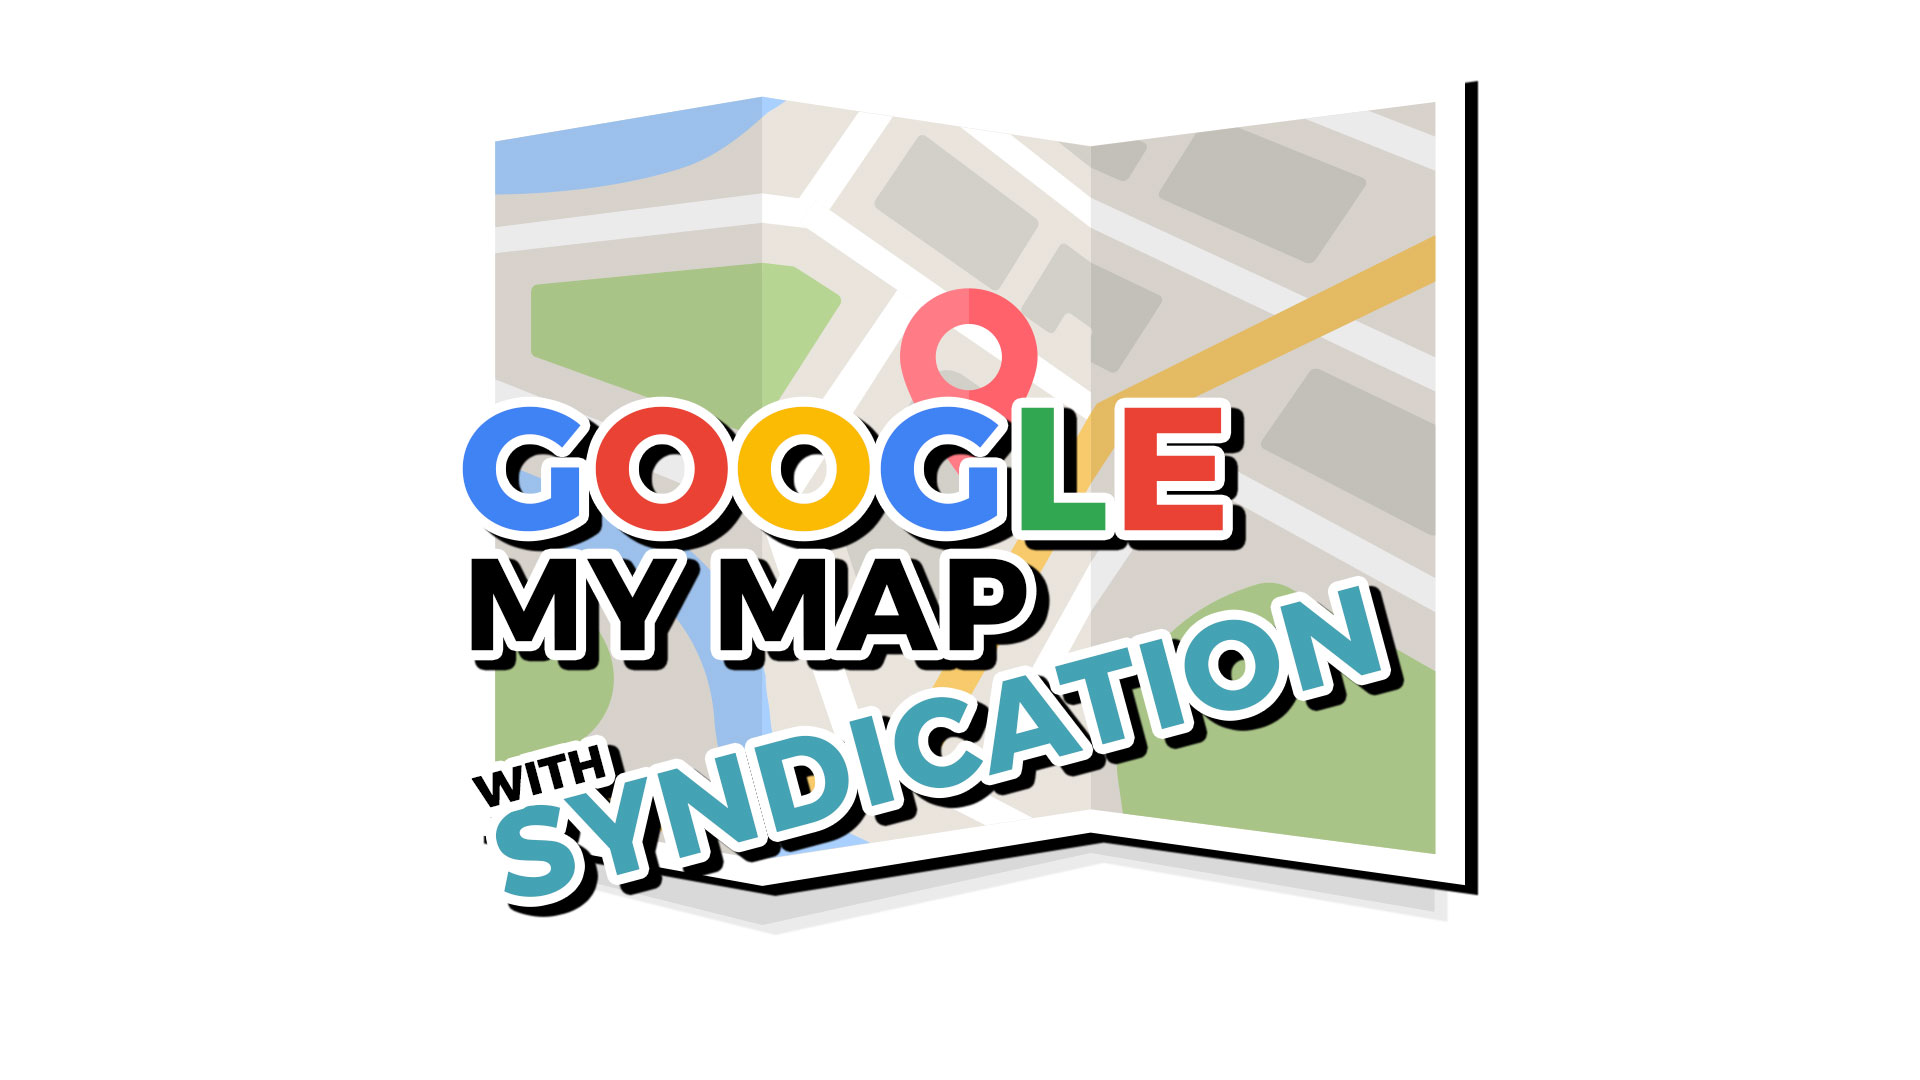 Google My Map